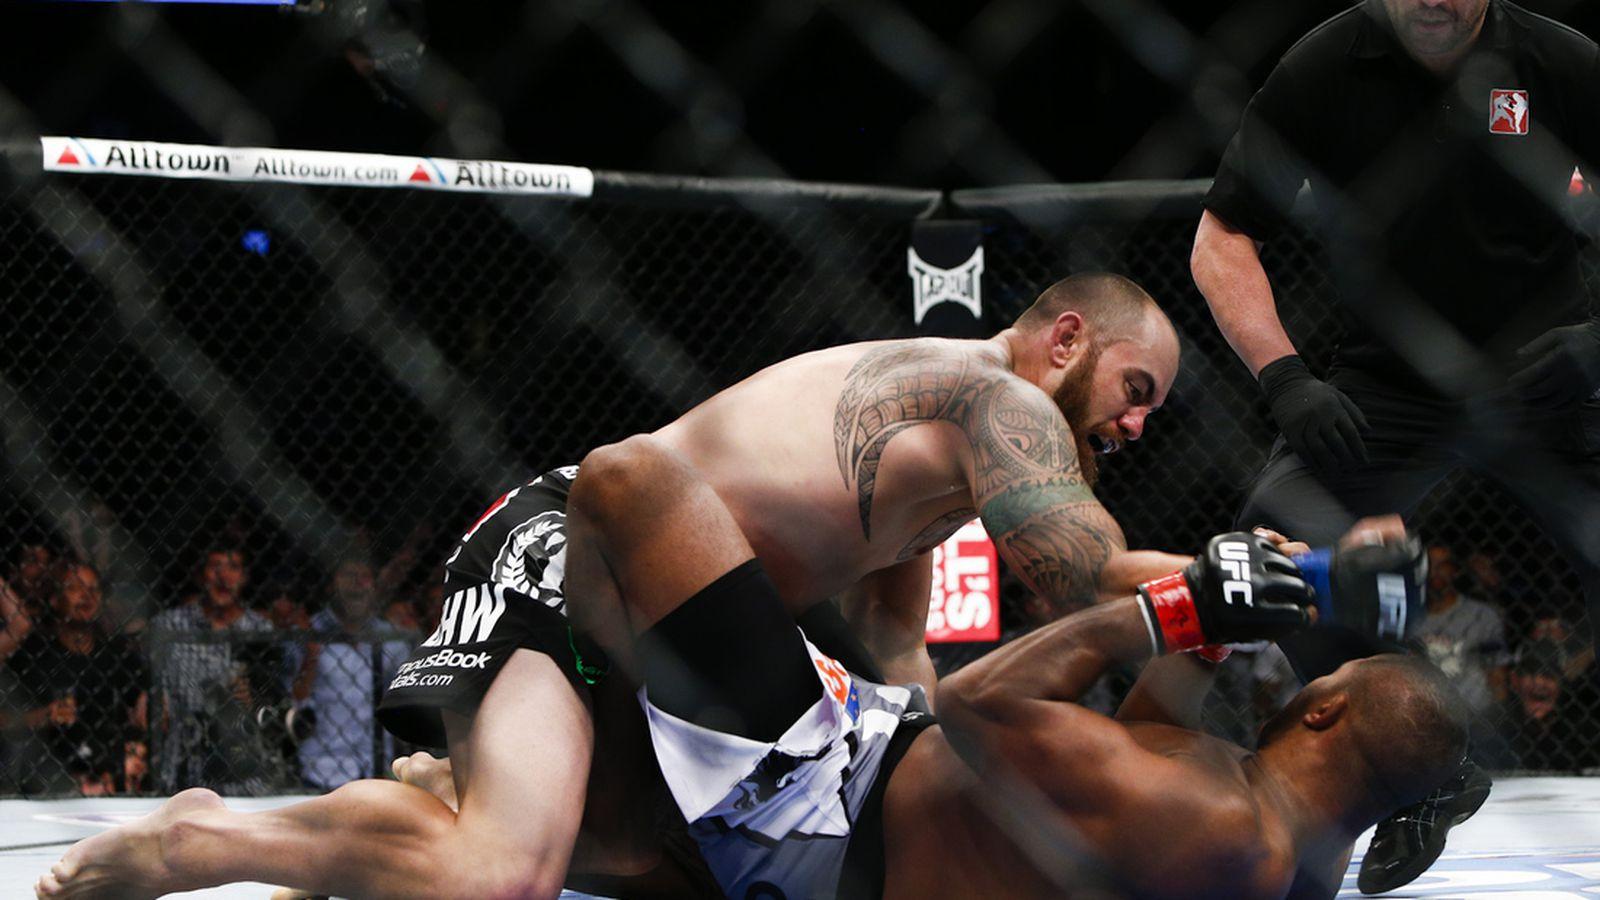 Alistair Overeem Vs Travis Browne Full Fight Video